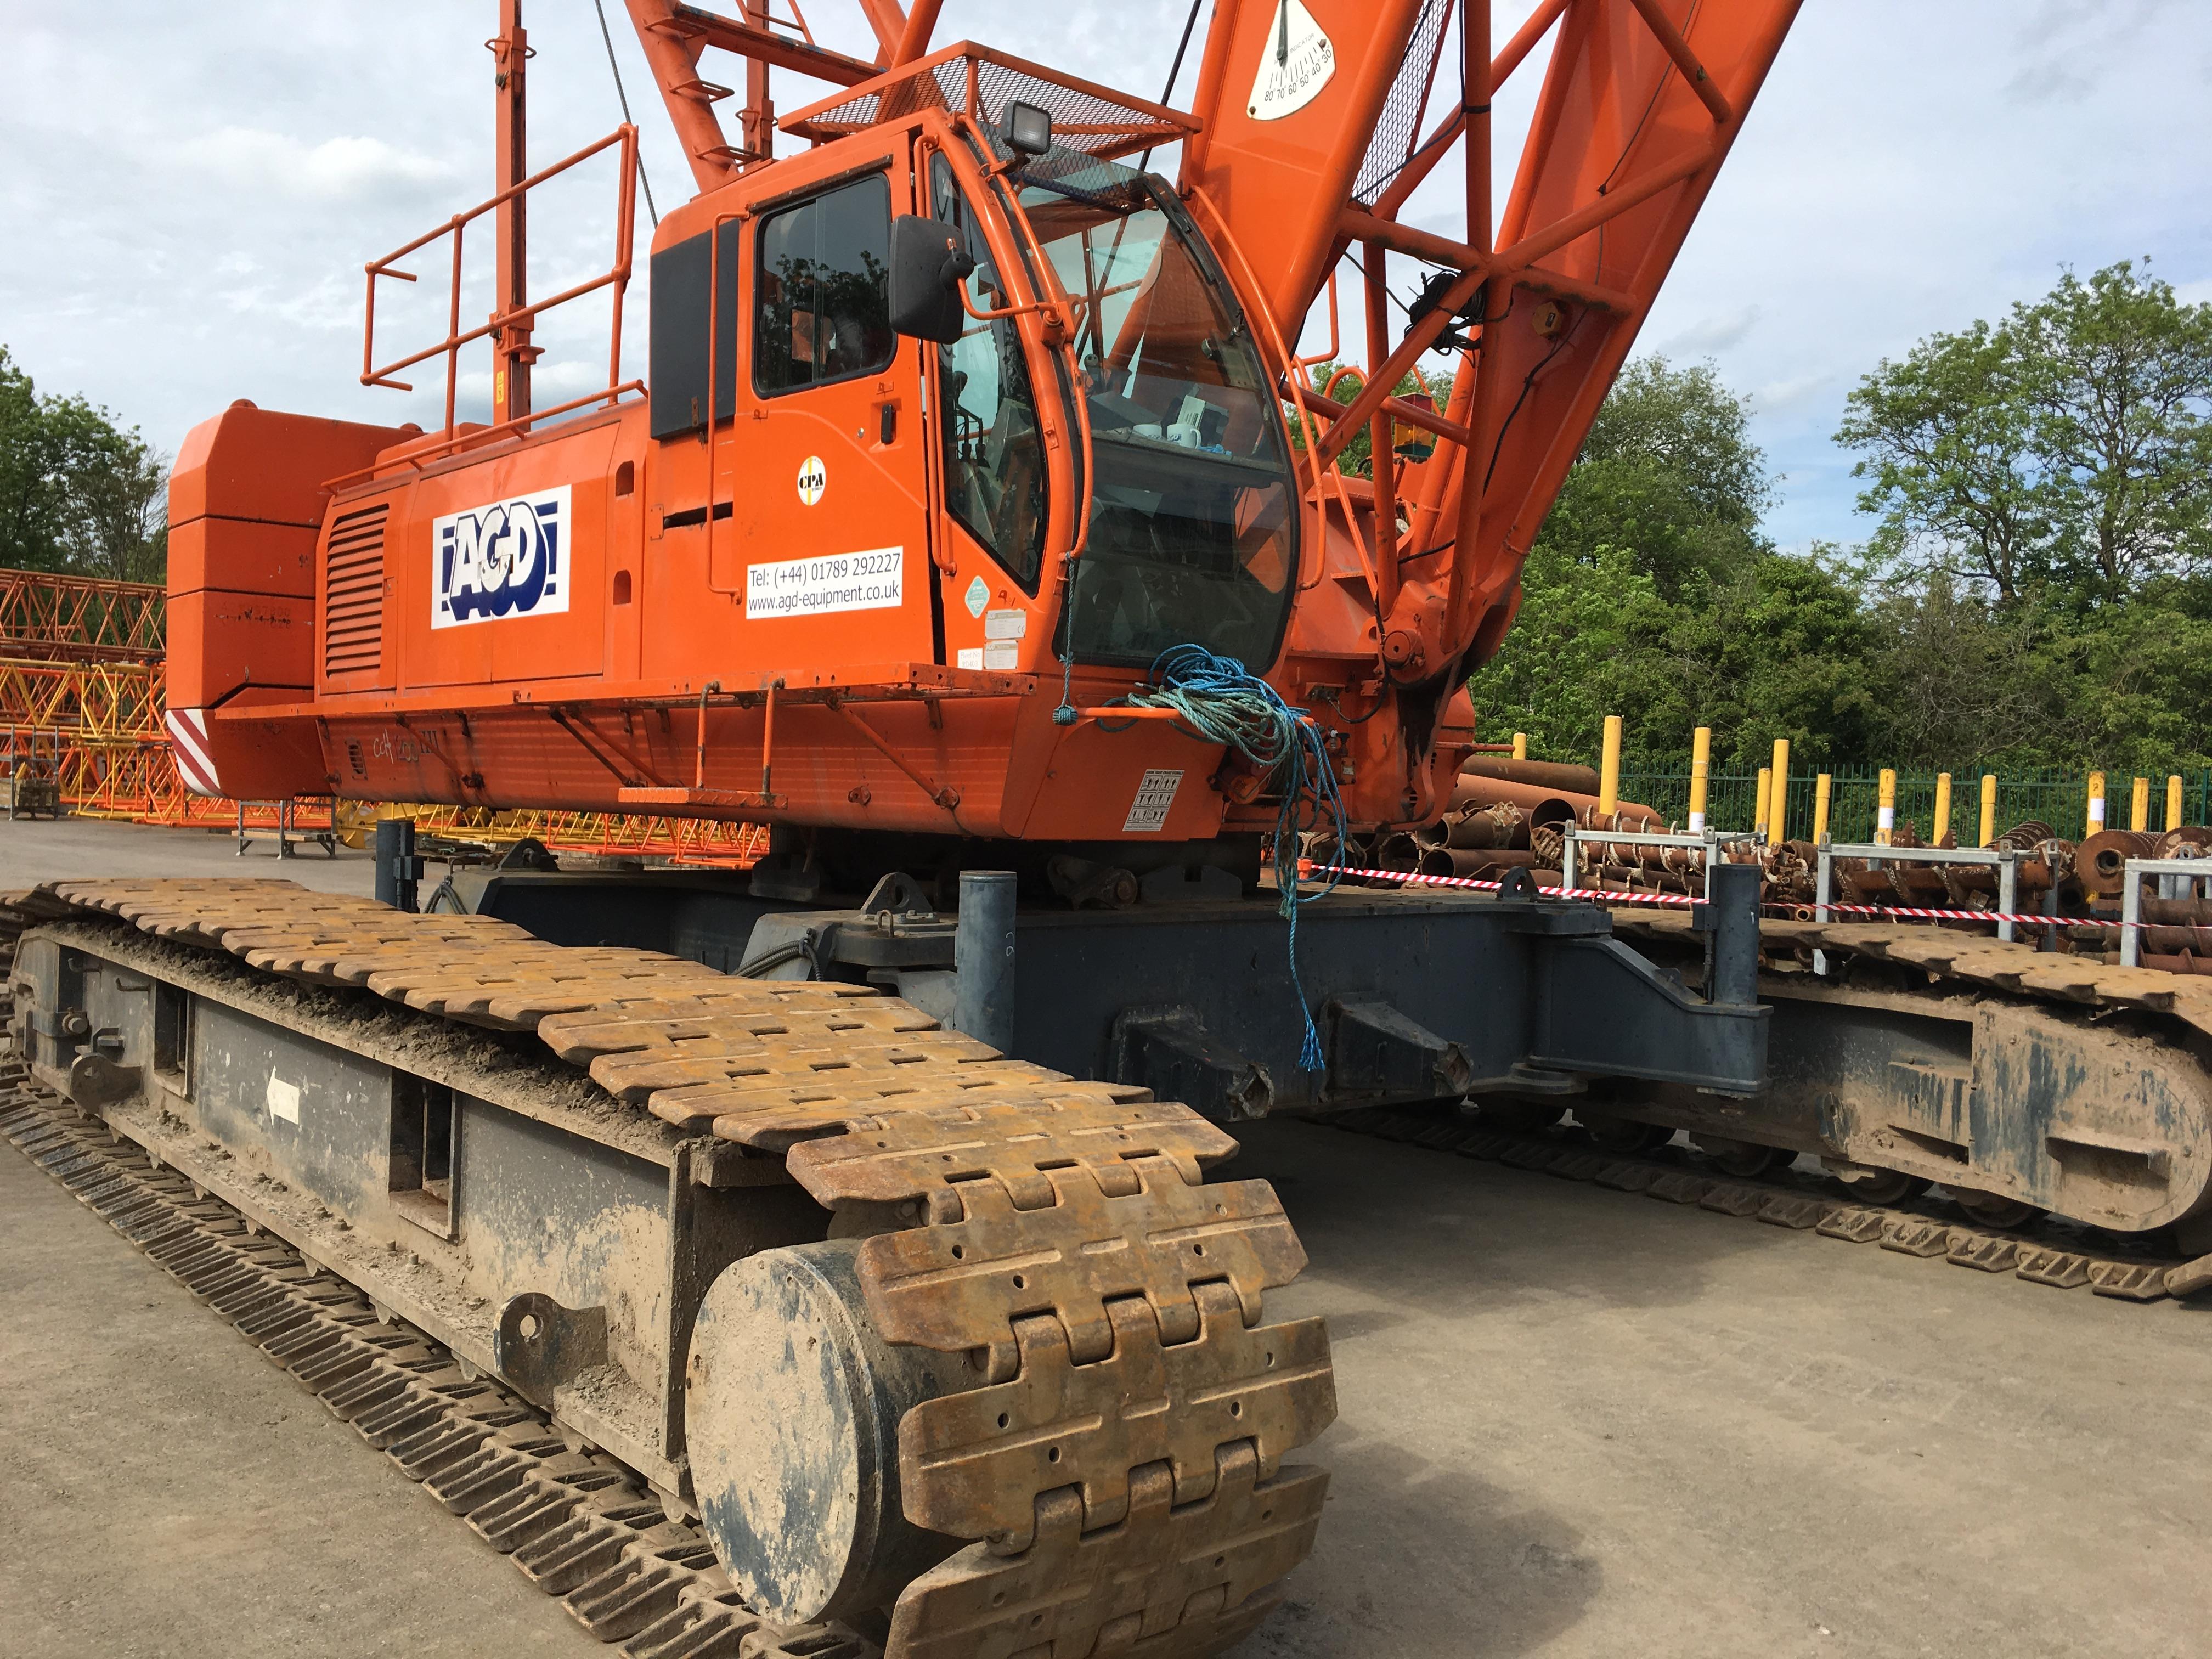 Used IHI CCH1200 120 tons Lattice Boom Crawler Crane For Sale